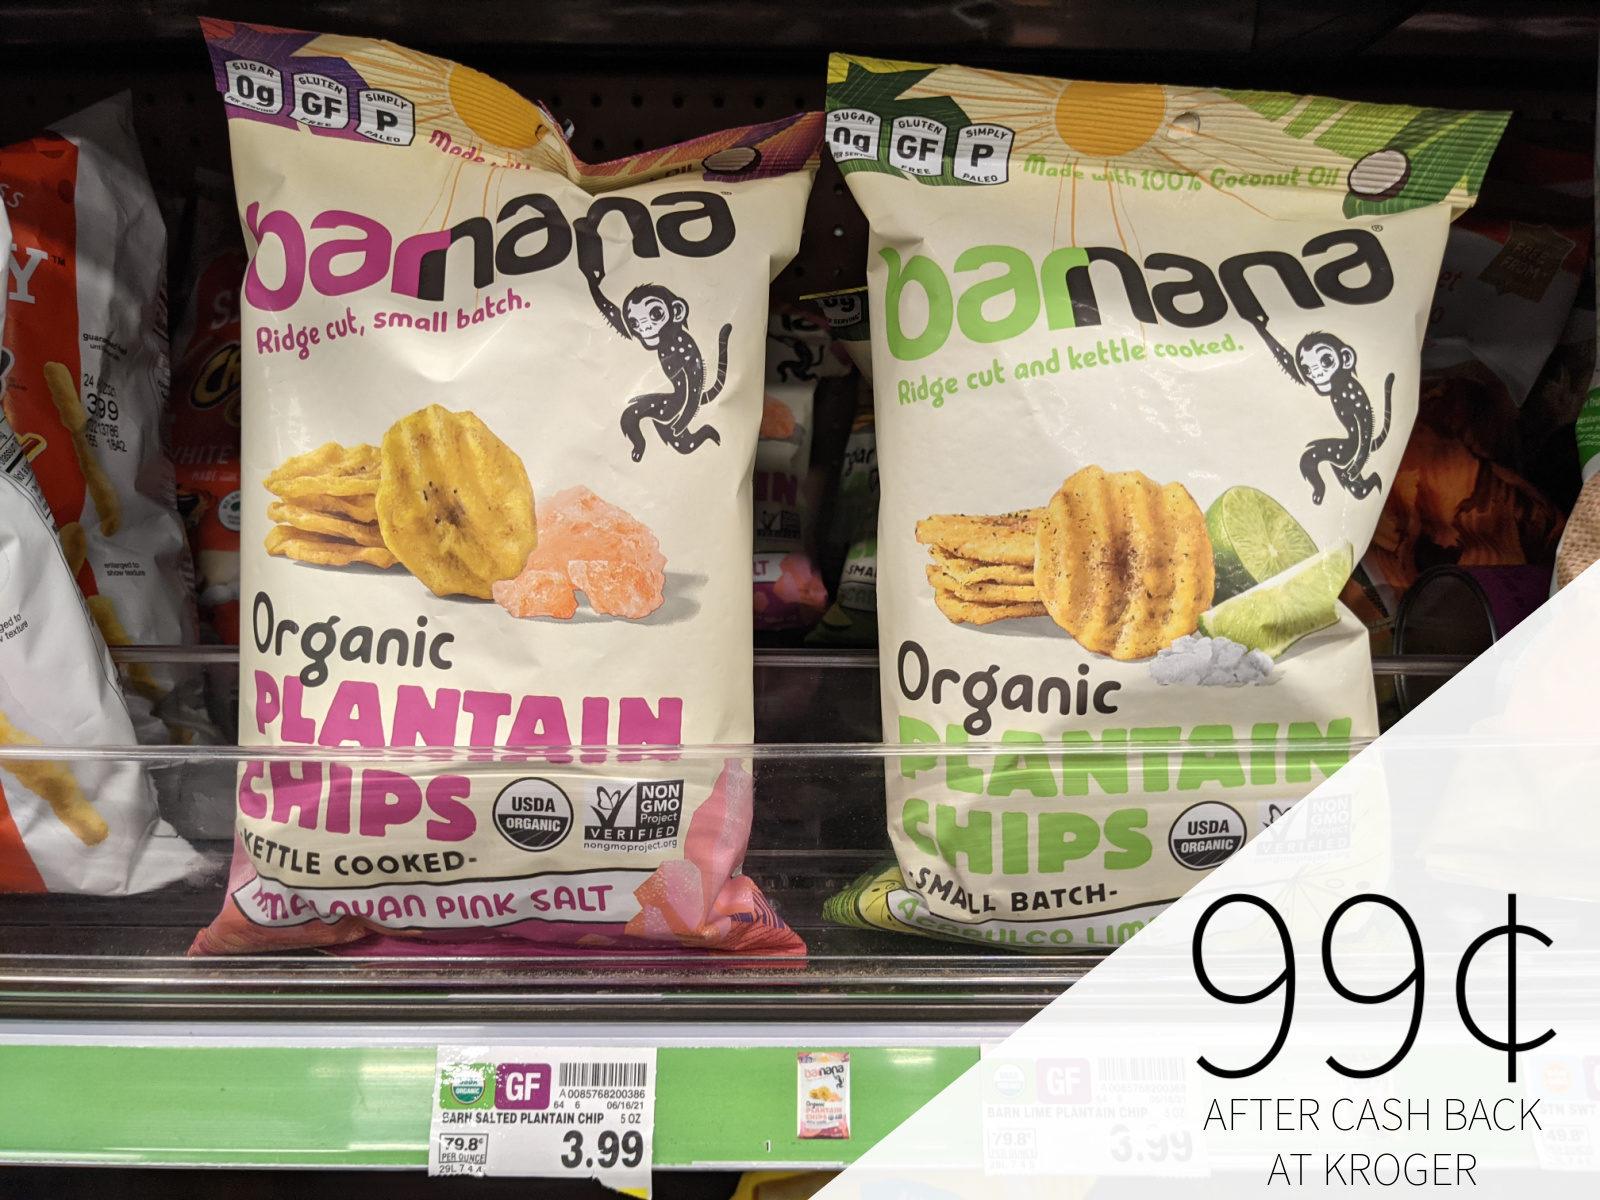 Barnana Chips Only 99¢ At Kroger